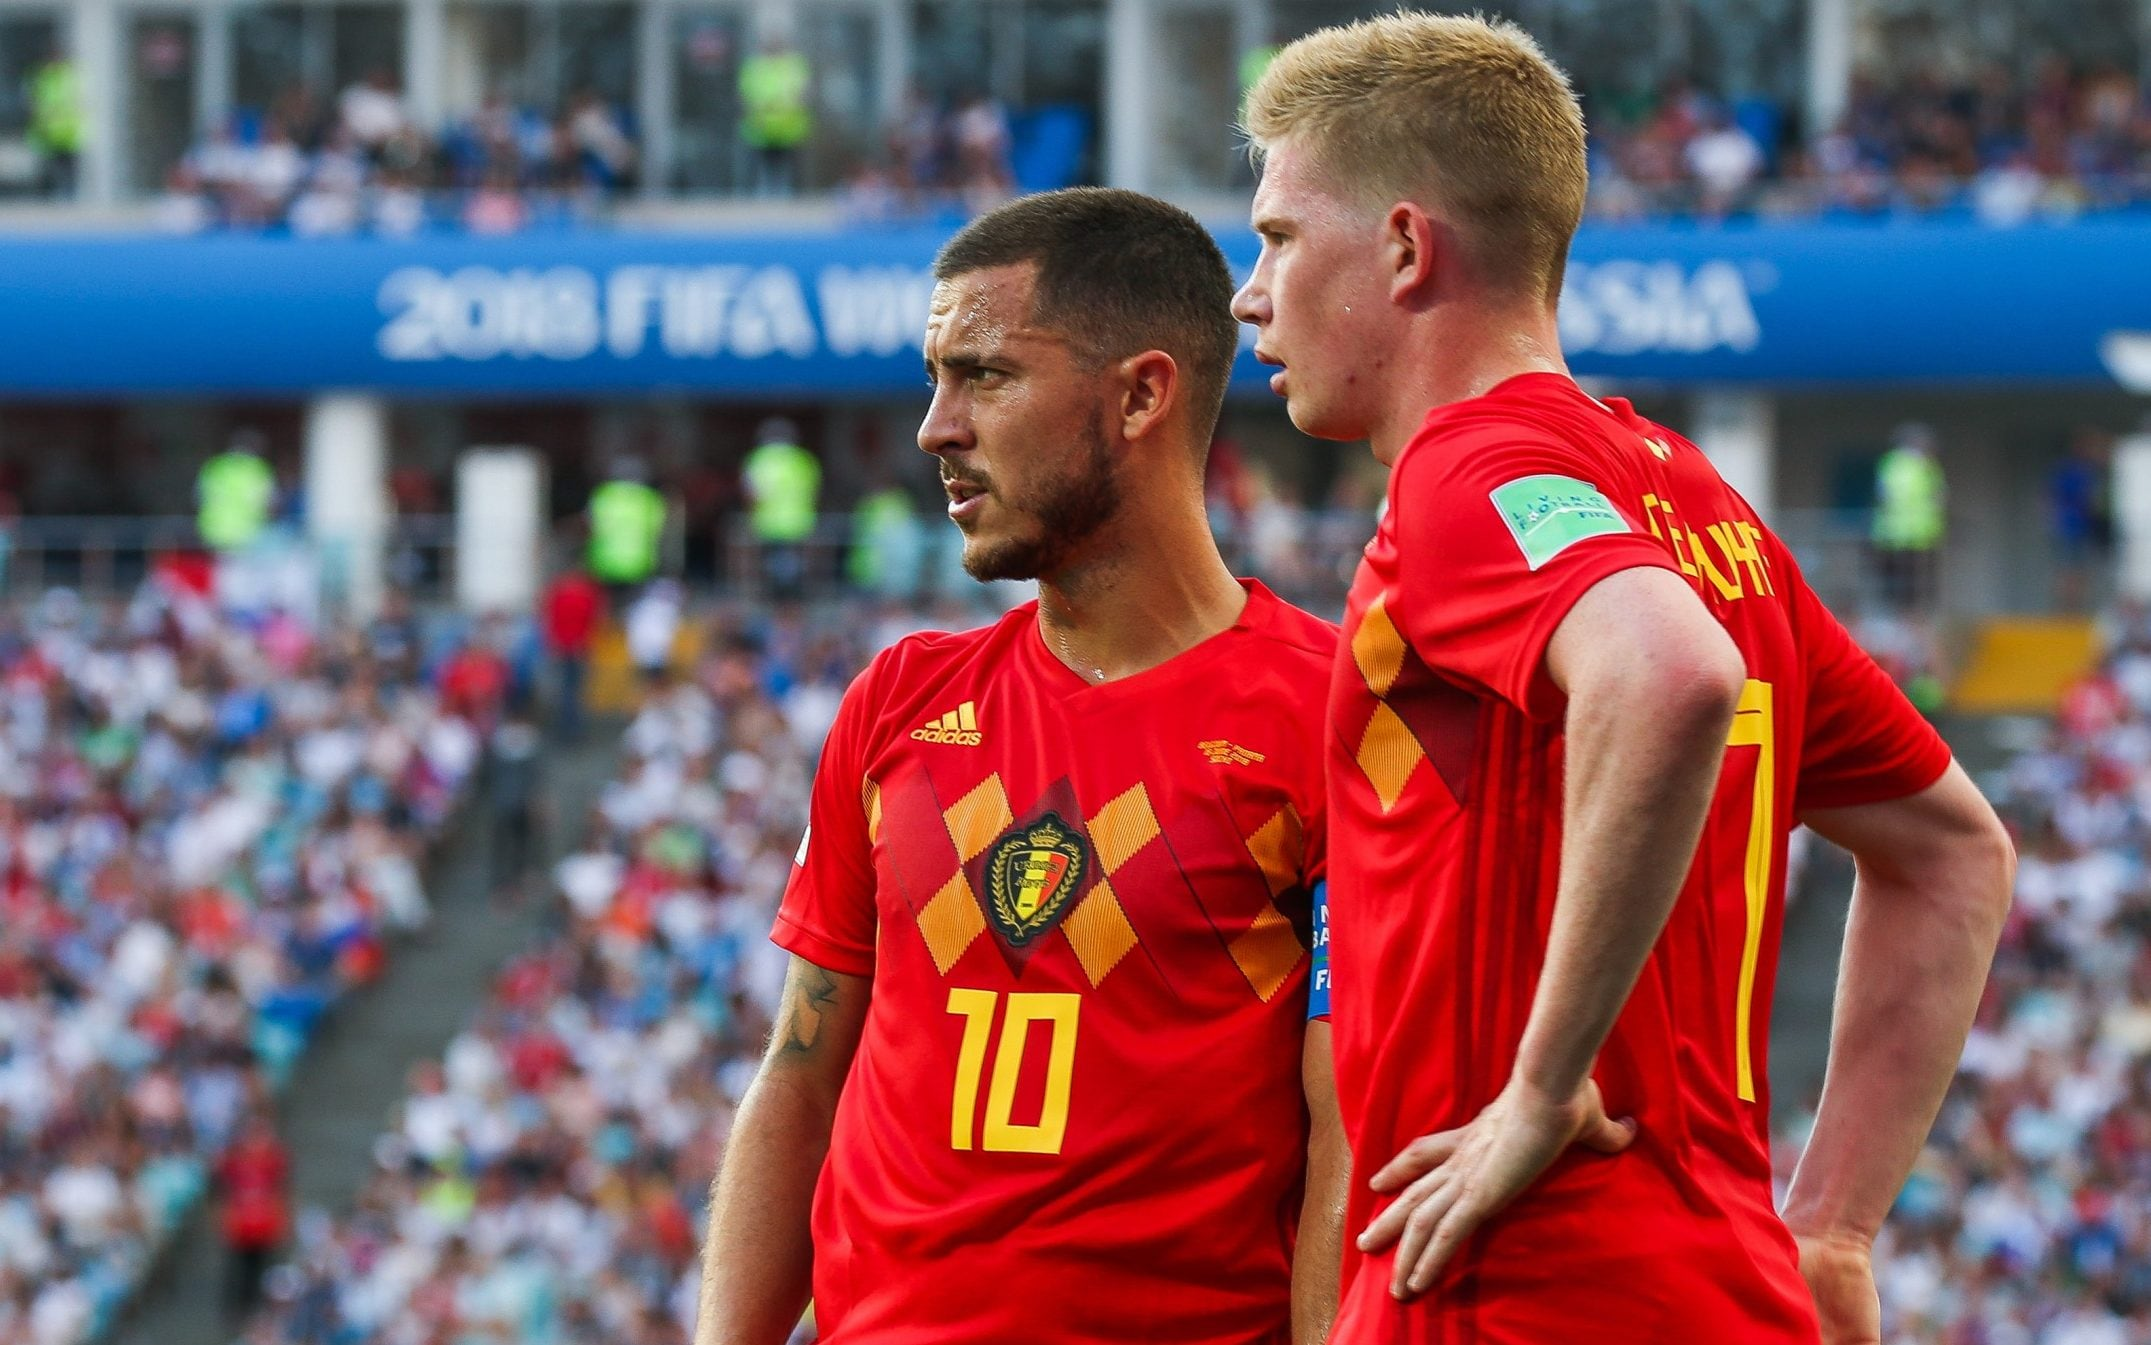 Eden Hazard and Kelvin Debruyne Injury Update Ahead of Italy Match